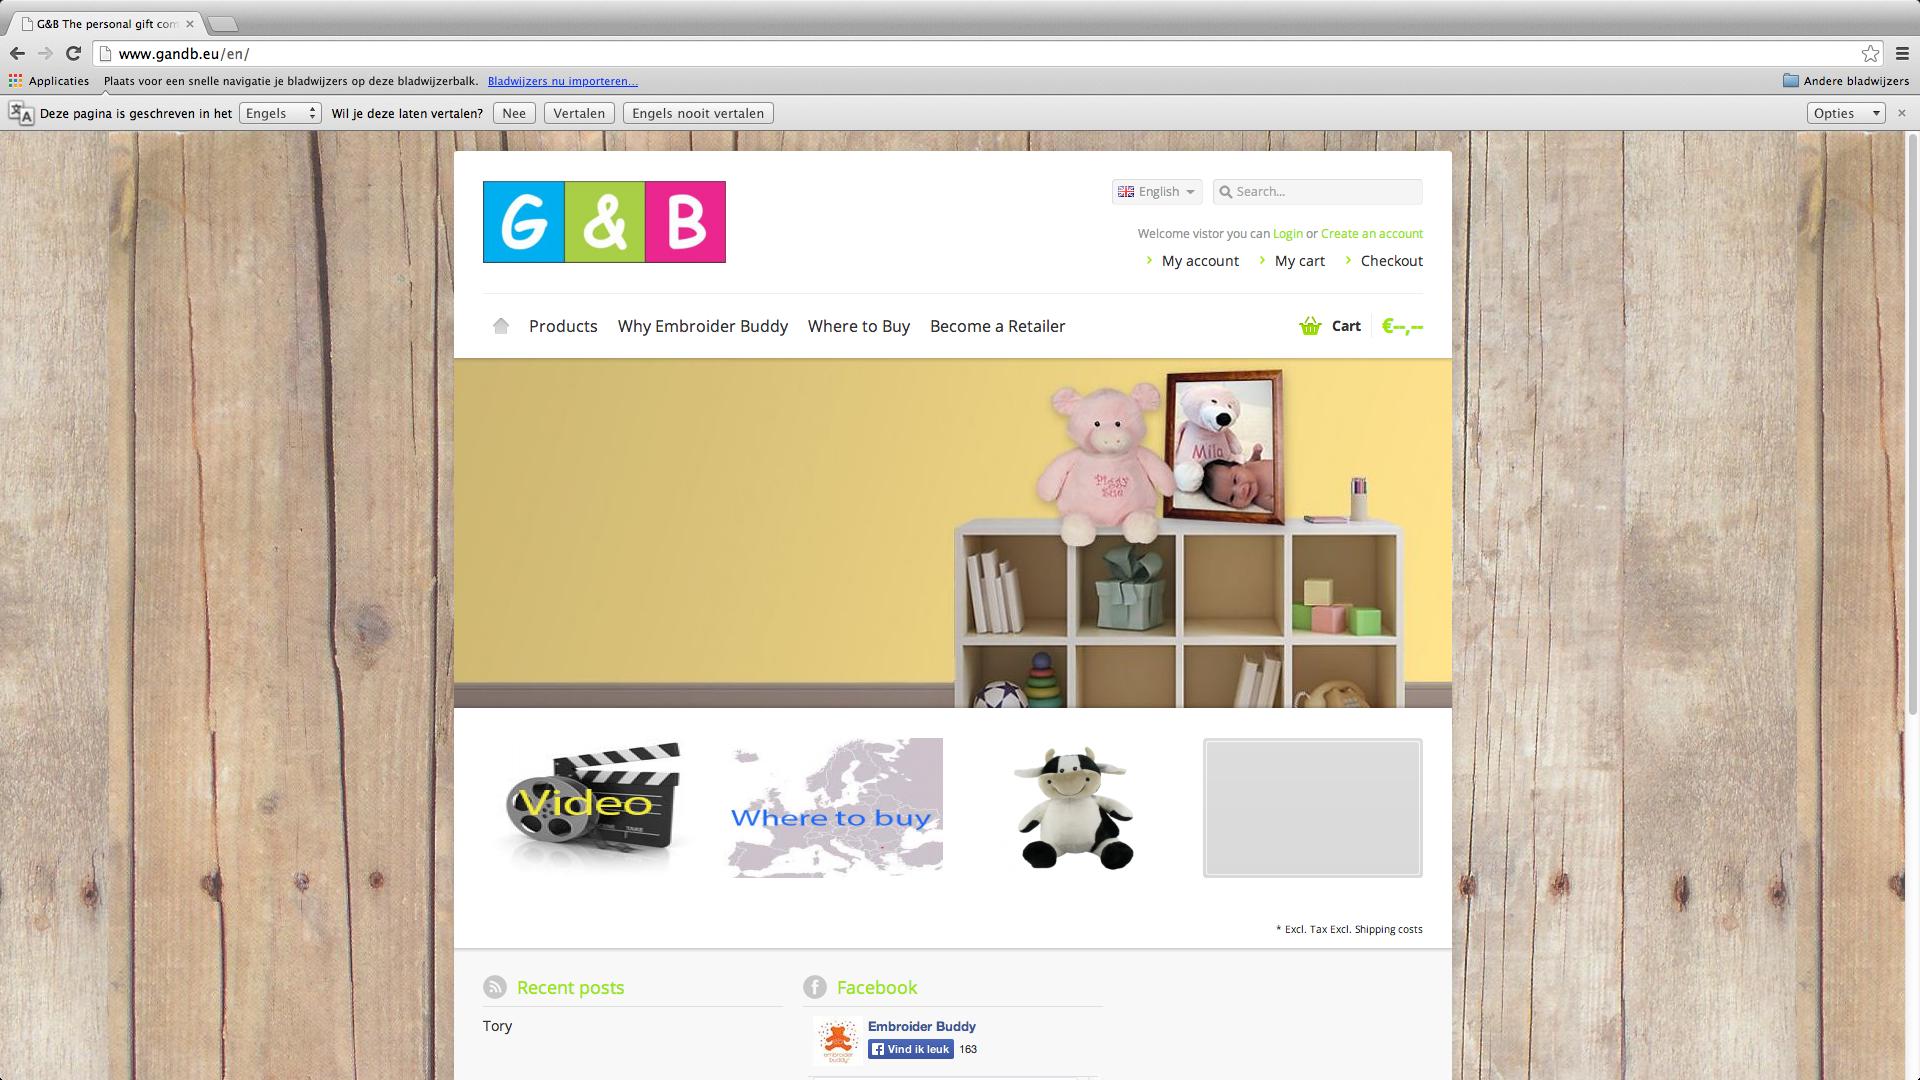 Website www.gandb.eu